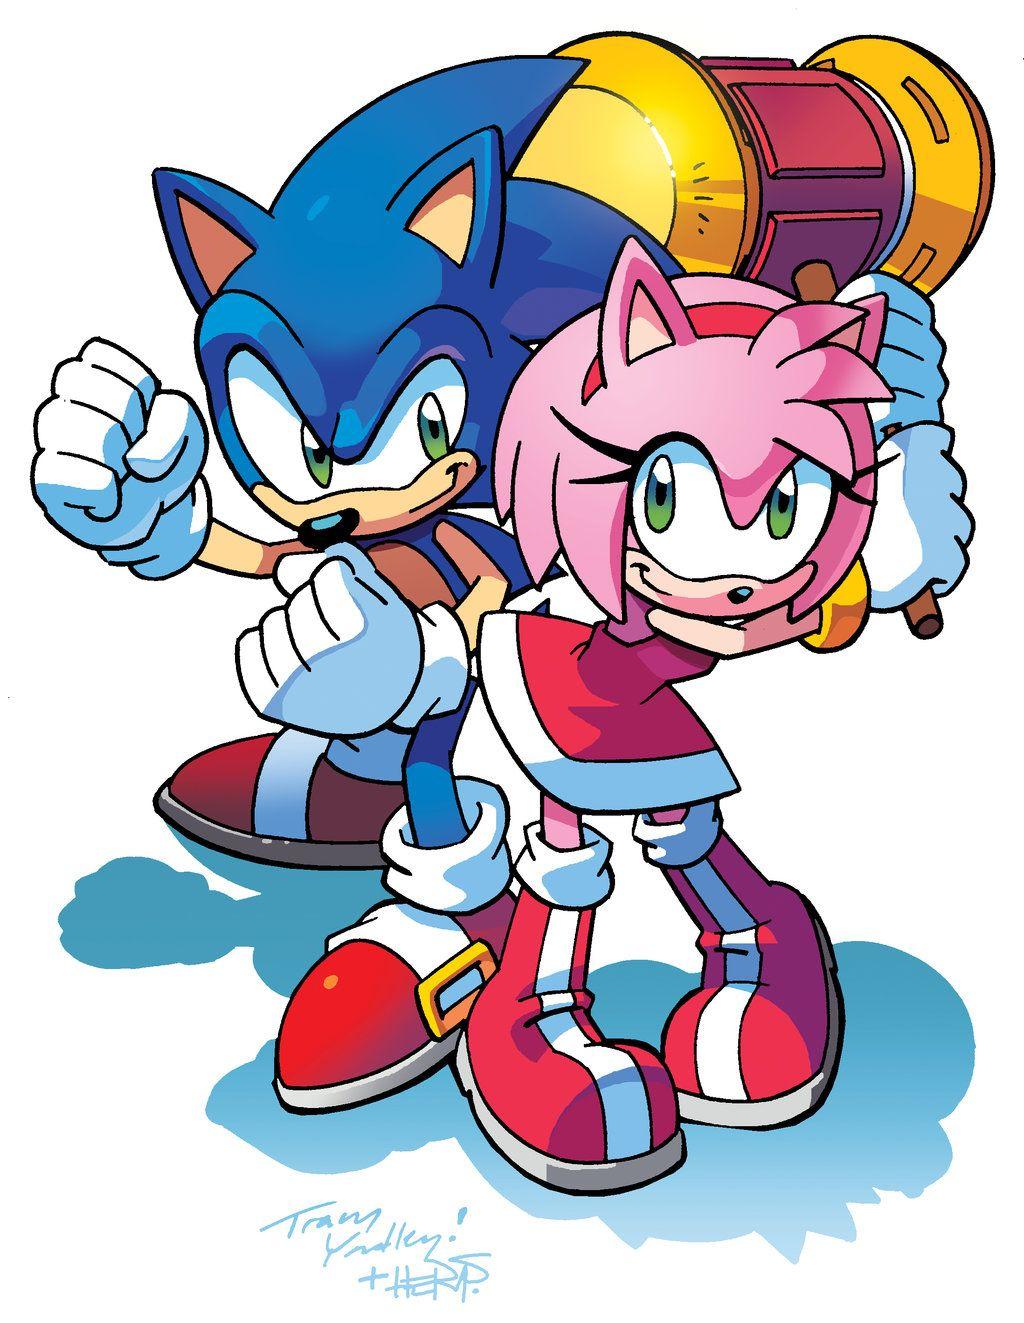 tracy yardley sonic the hedgehog - Google Search | Sonic ...